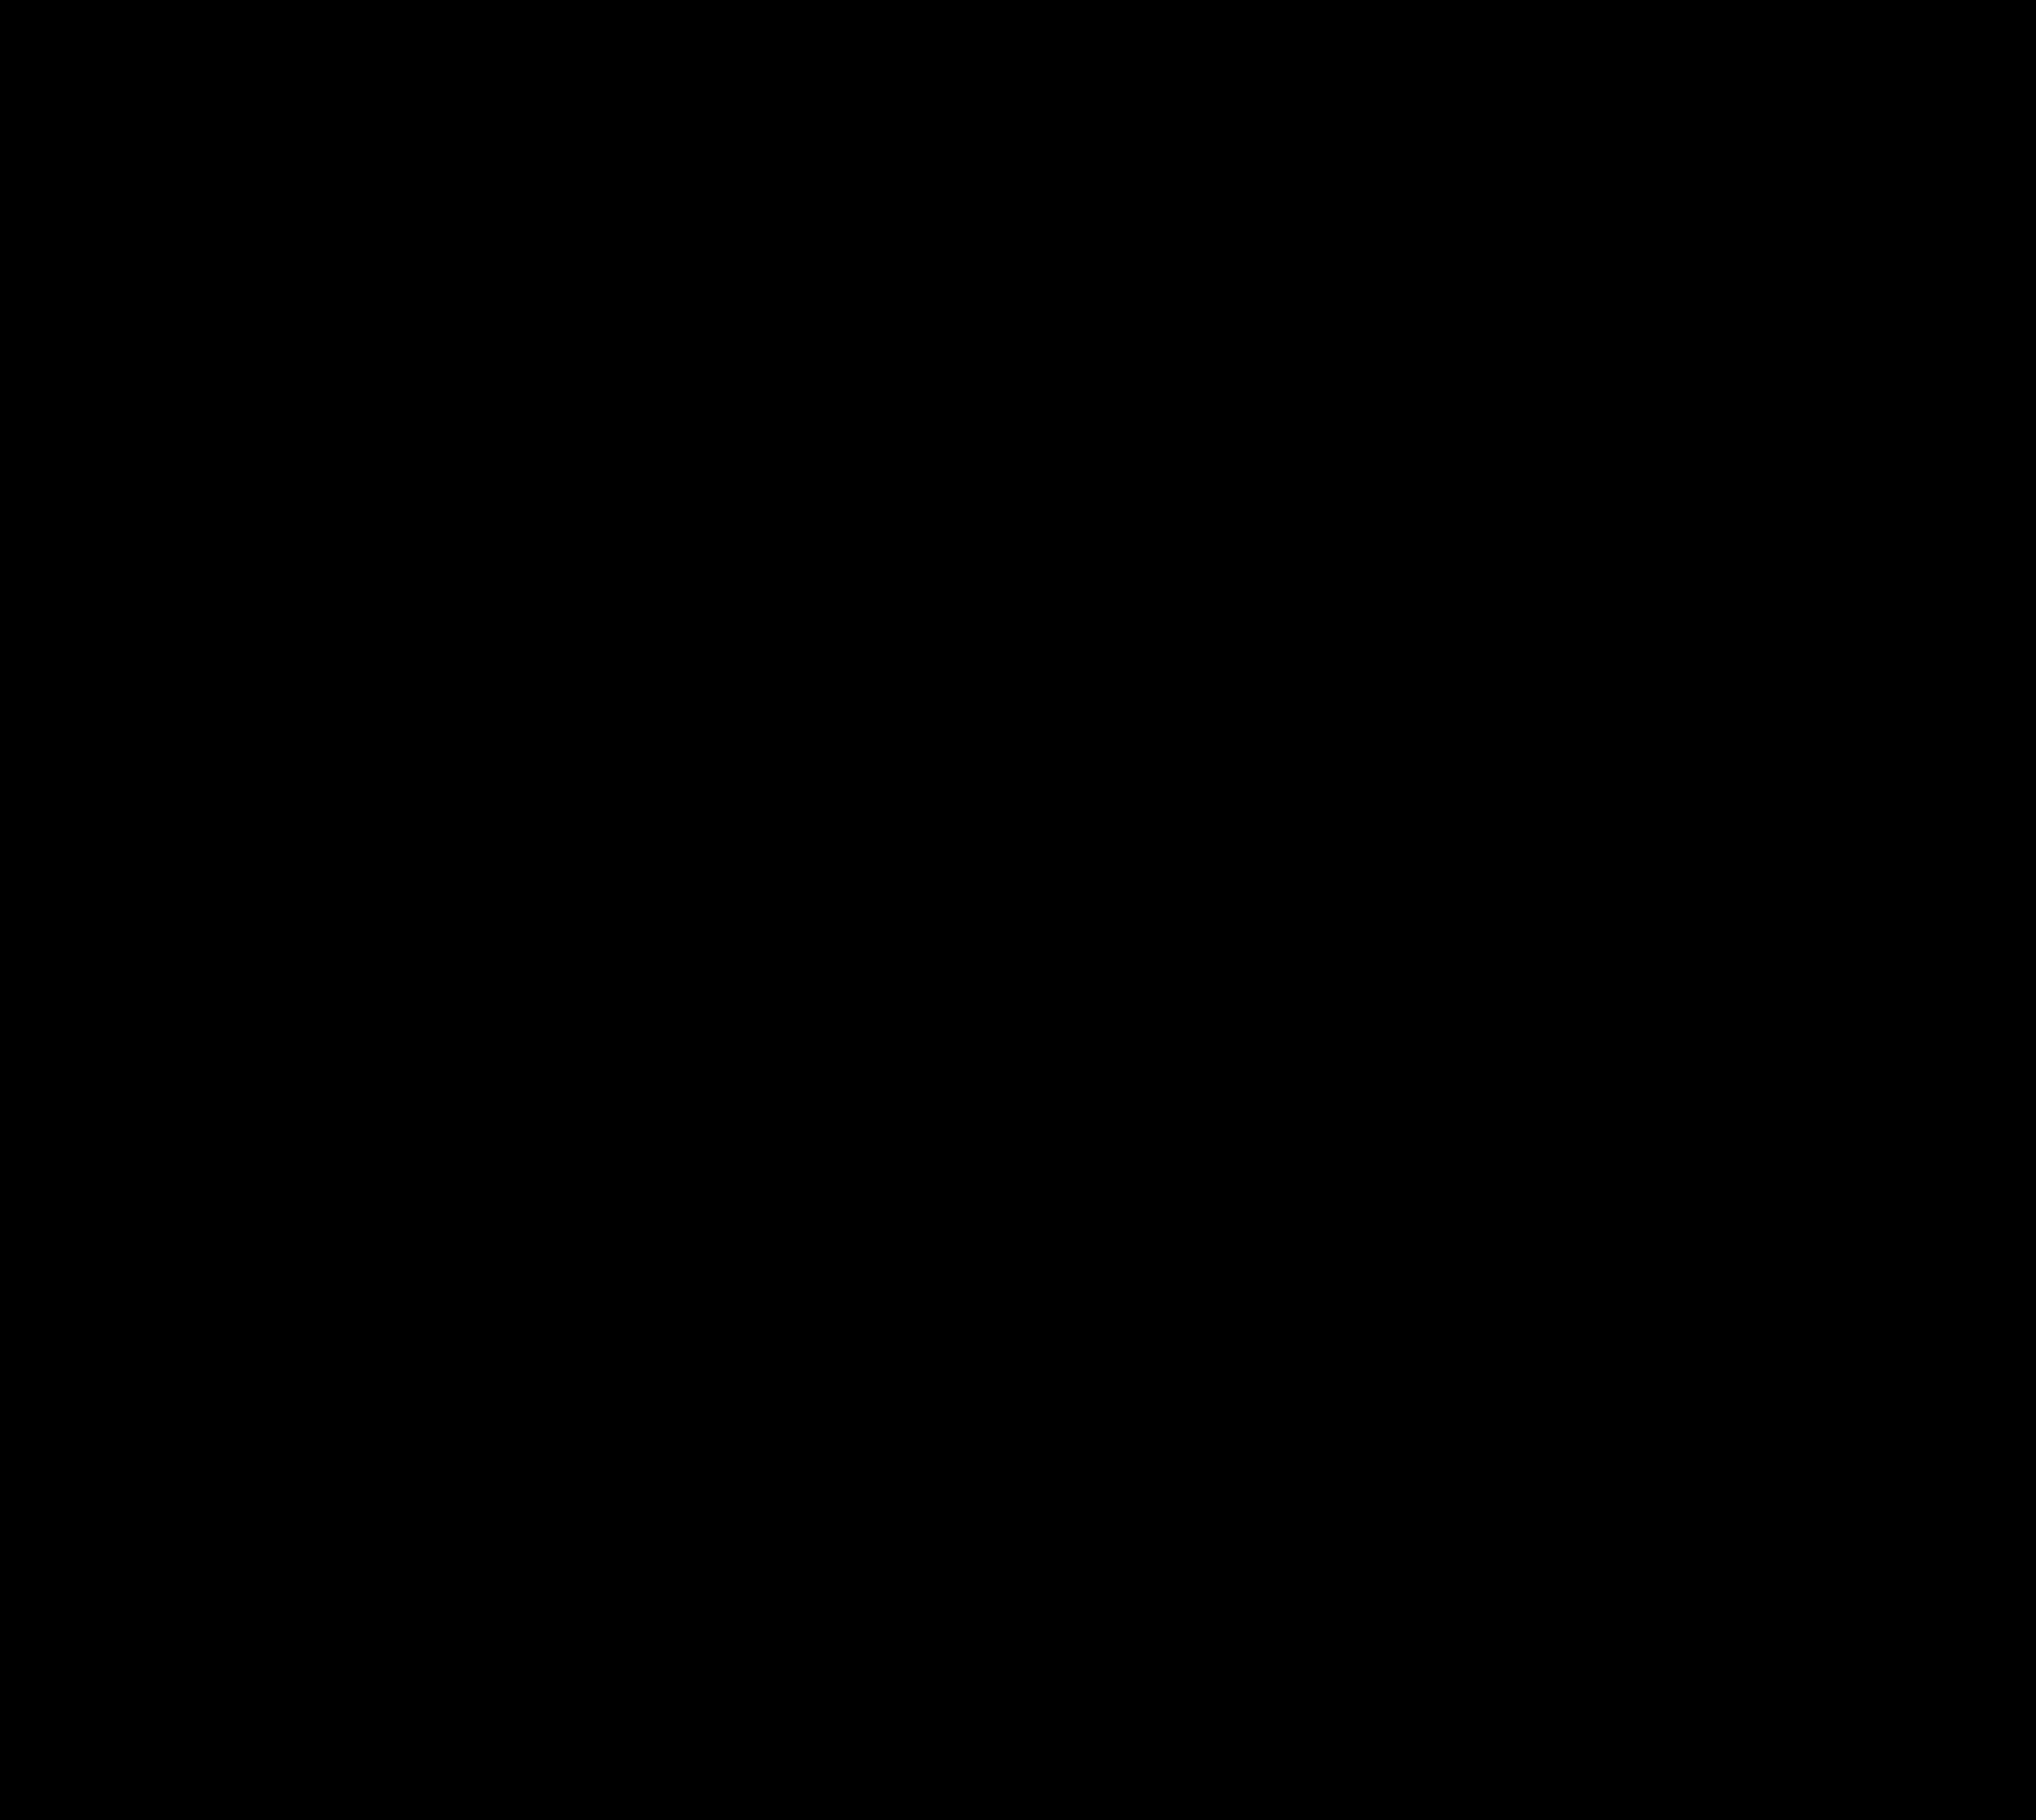 Heart corner clipart black and white download Clipart - Heart Corner Decoration Expanded black and white download